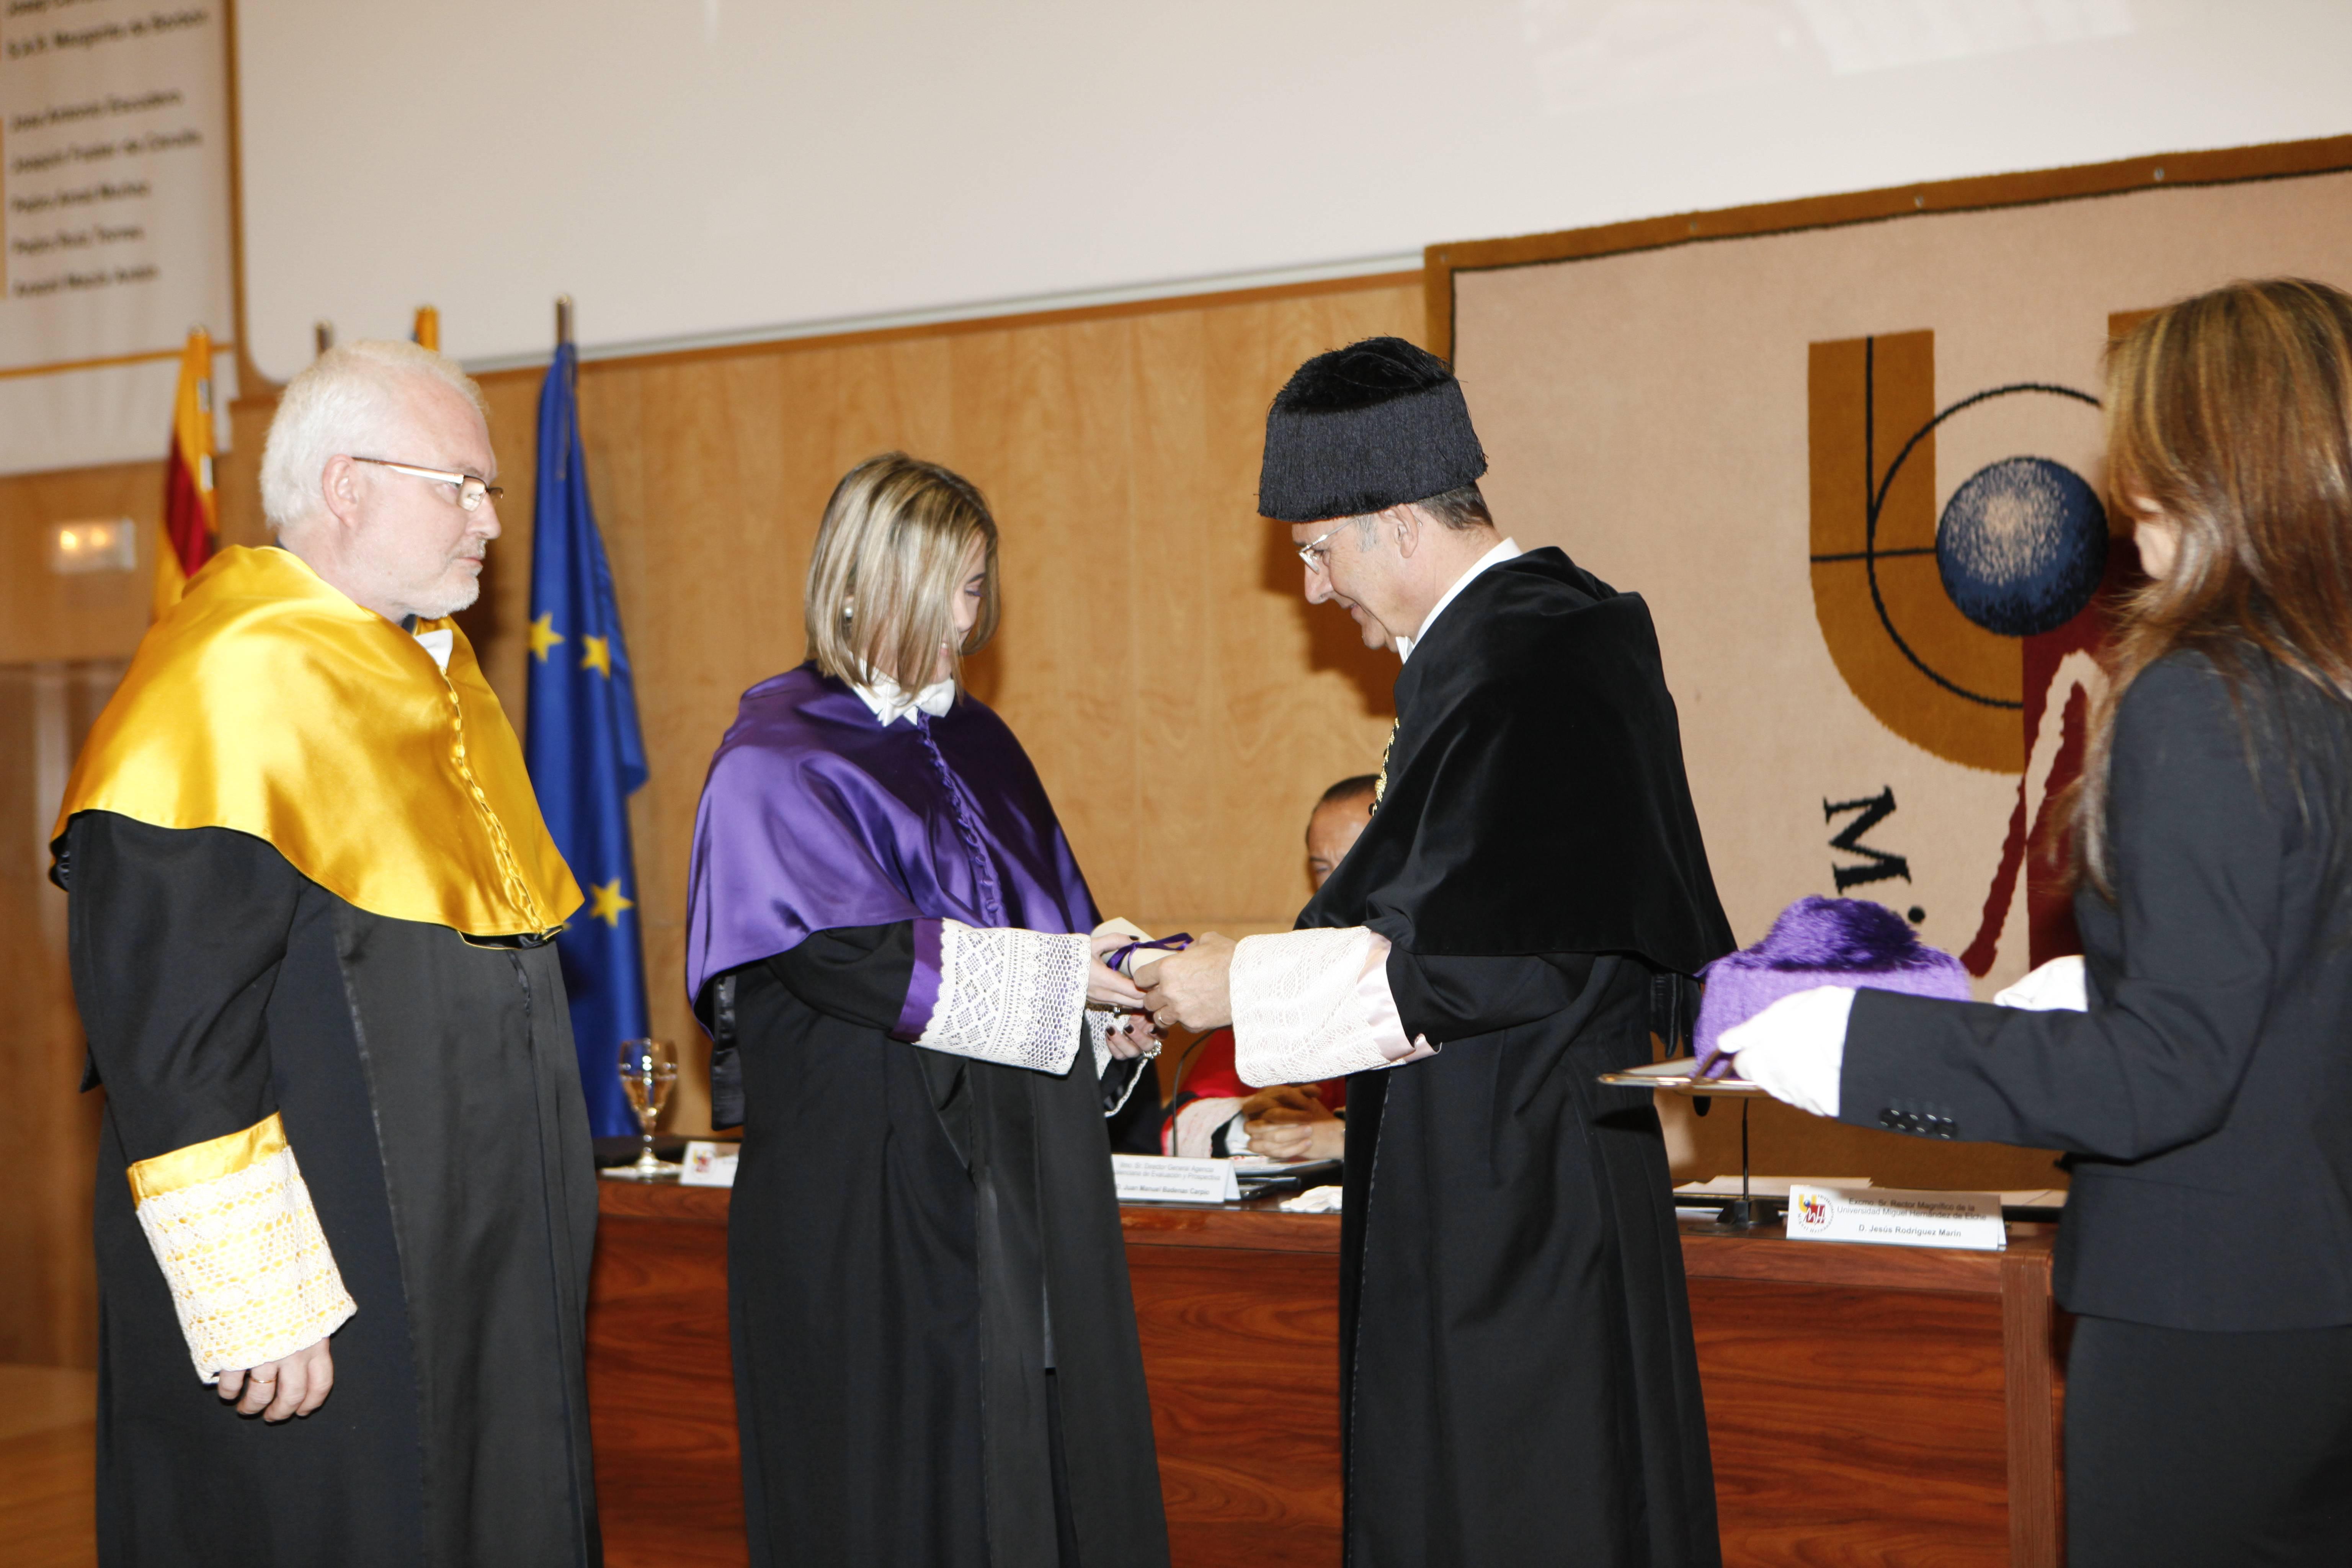 doctor-honoris-causa-luis-gamir_mg_1109.jpg